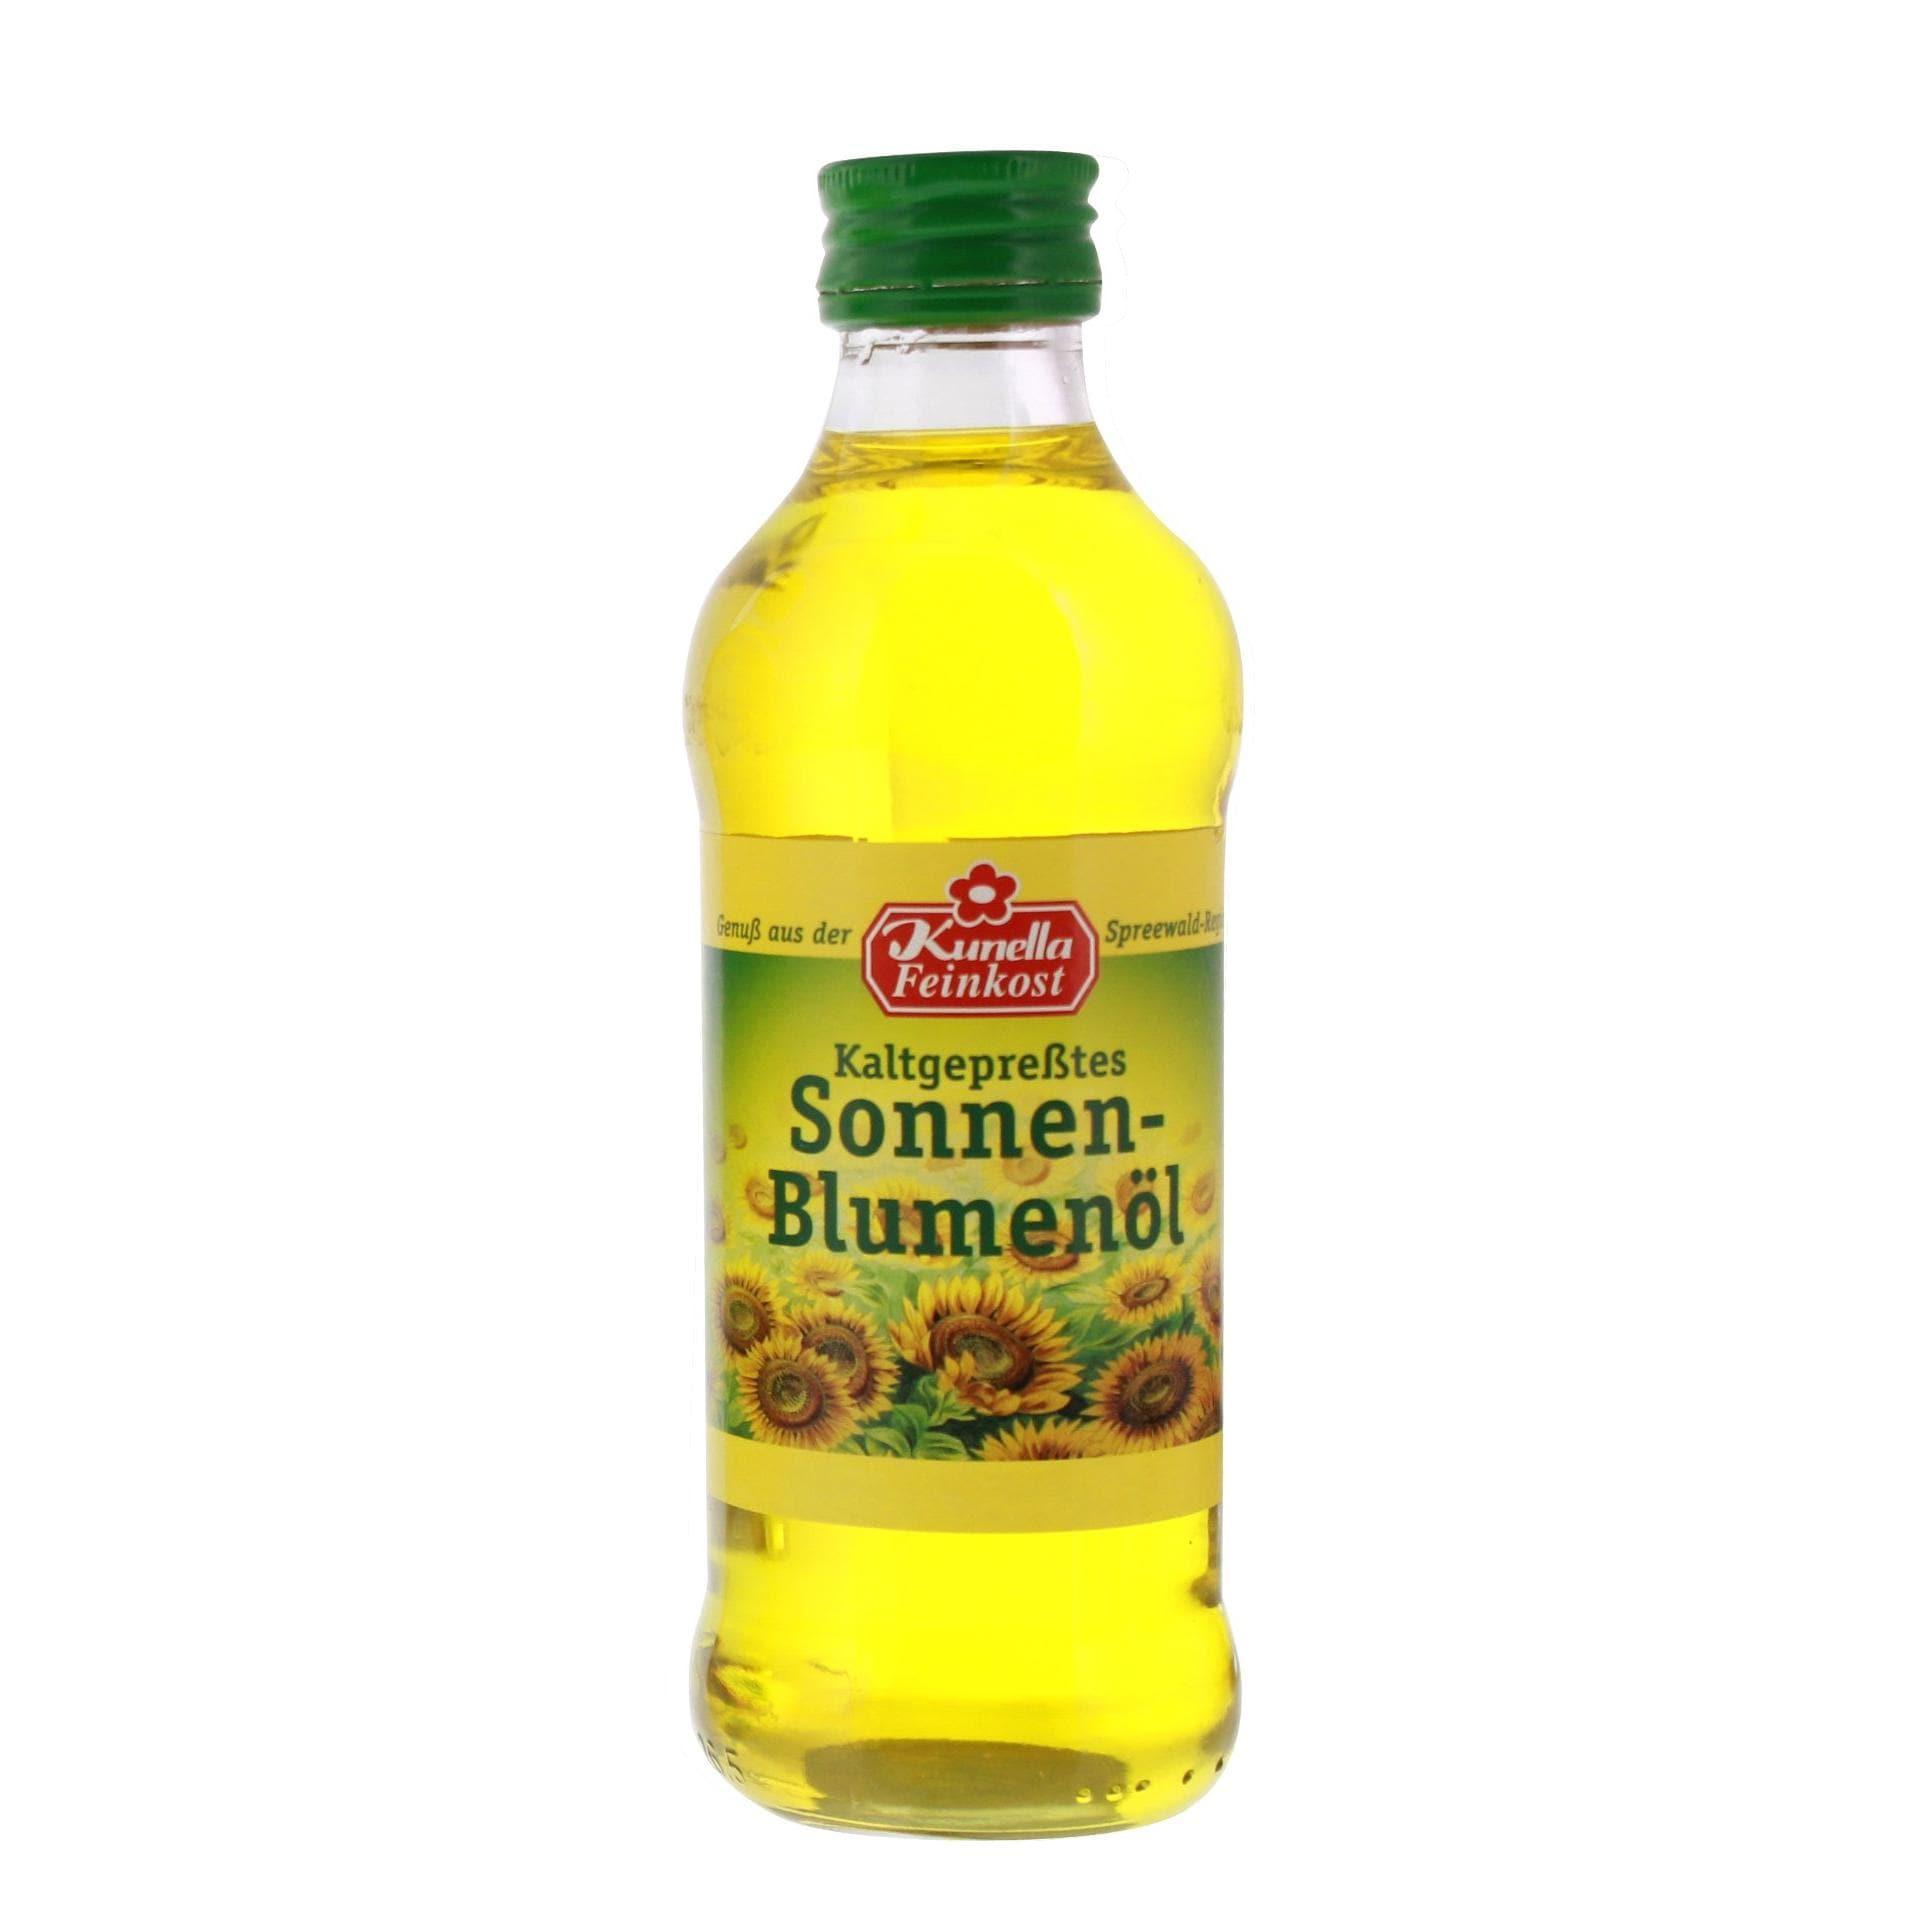 Kunella Feinkost - kaltgepresstes Sonnenblumenöl - 250ml